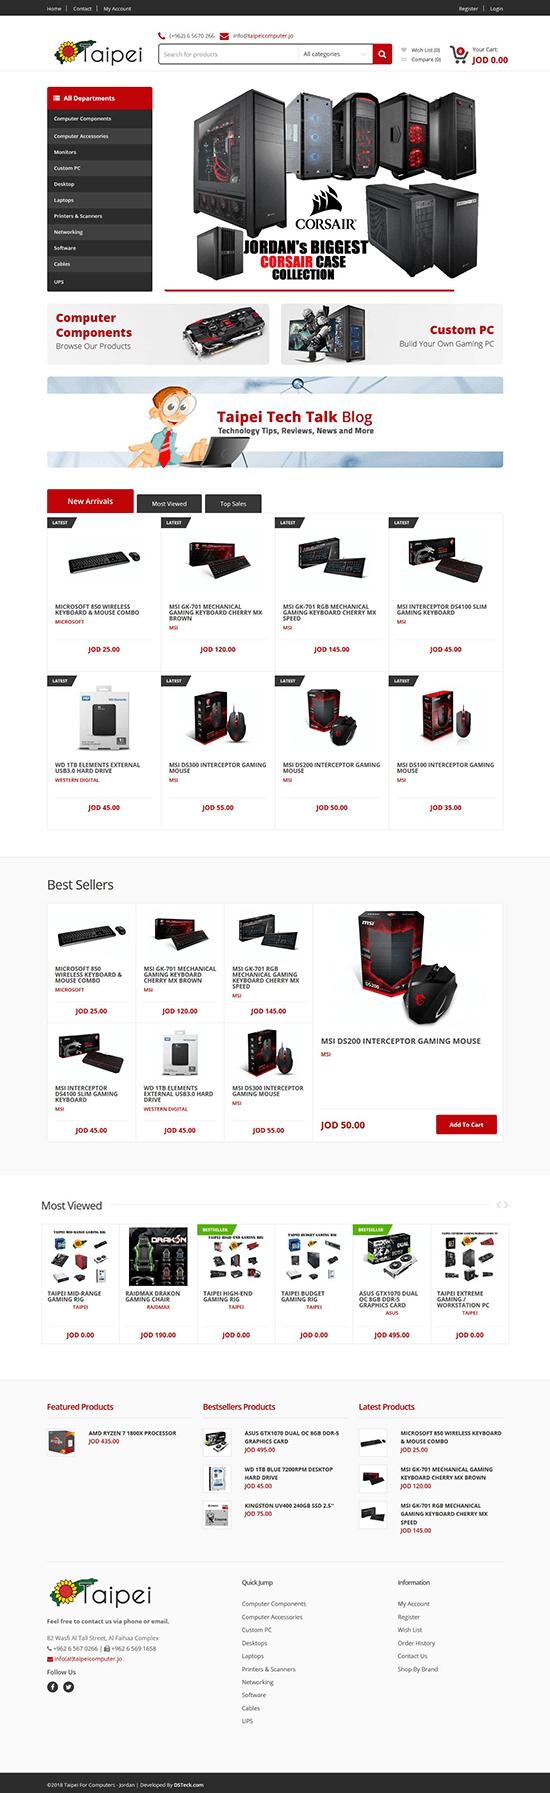 Taipei For Computers – Jordan